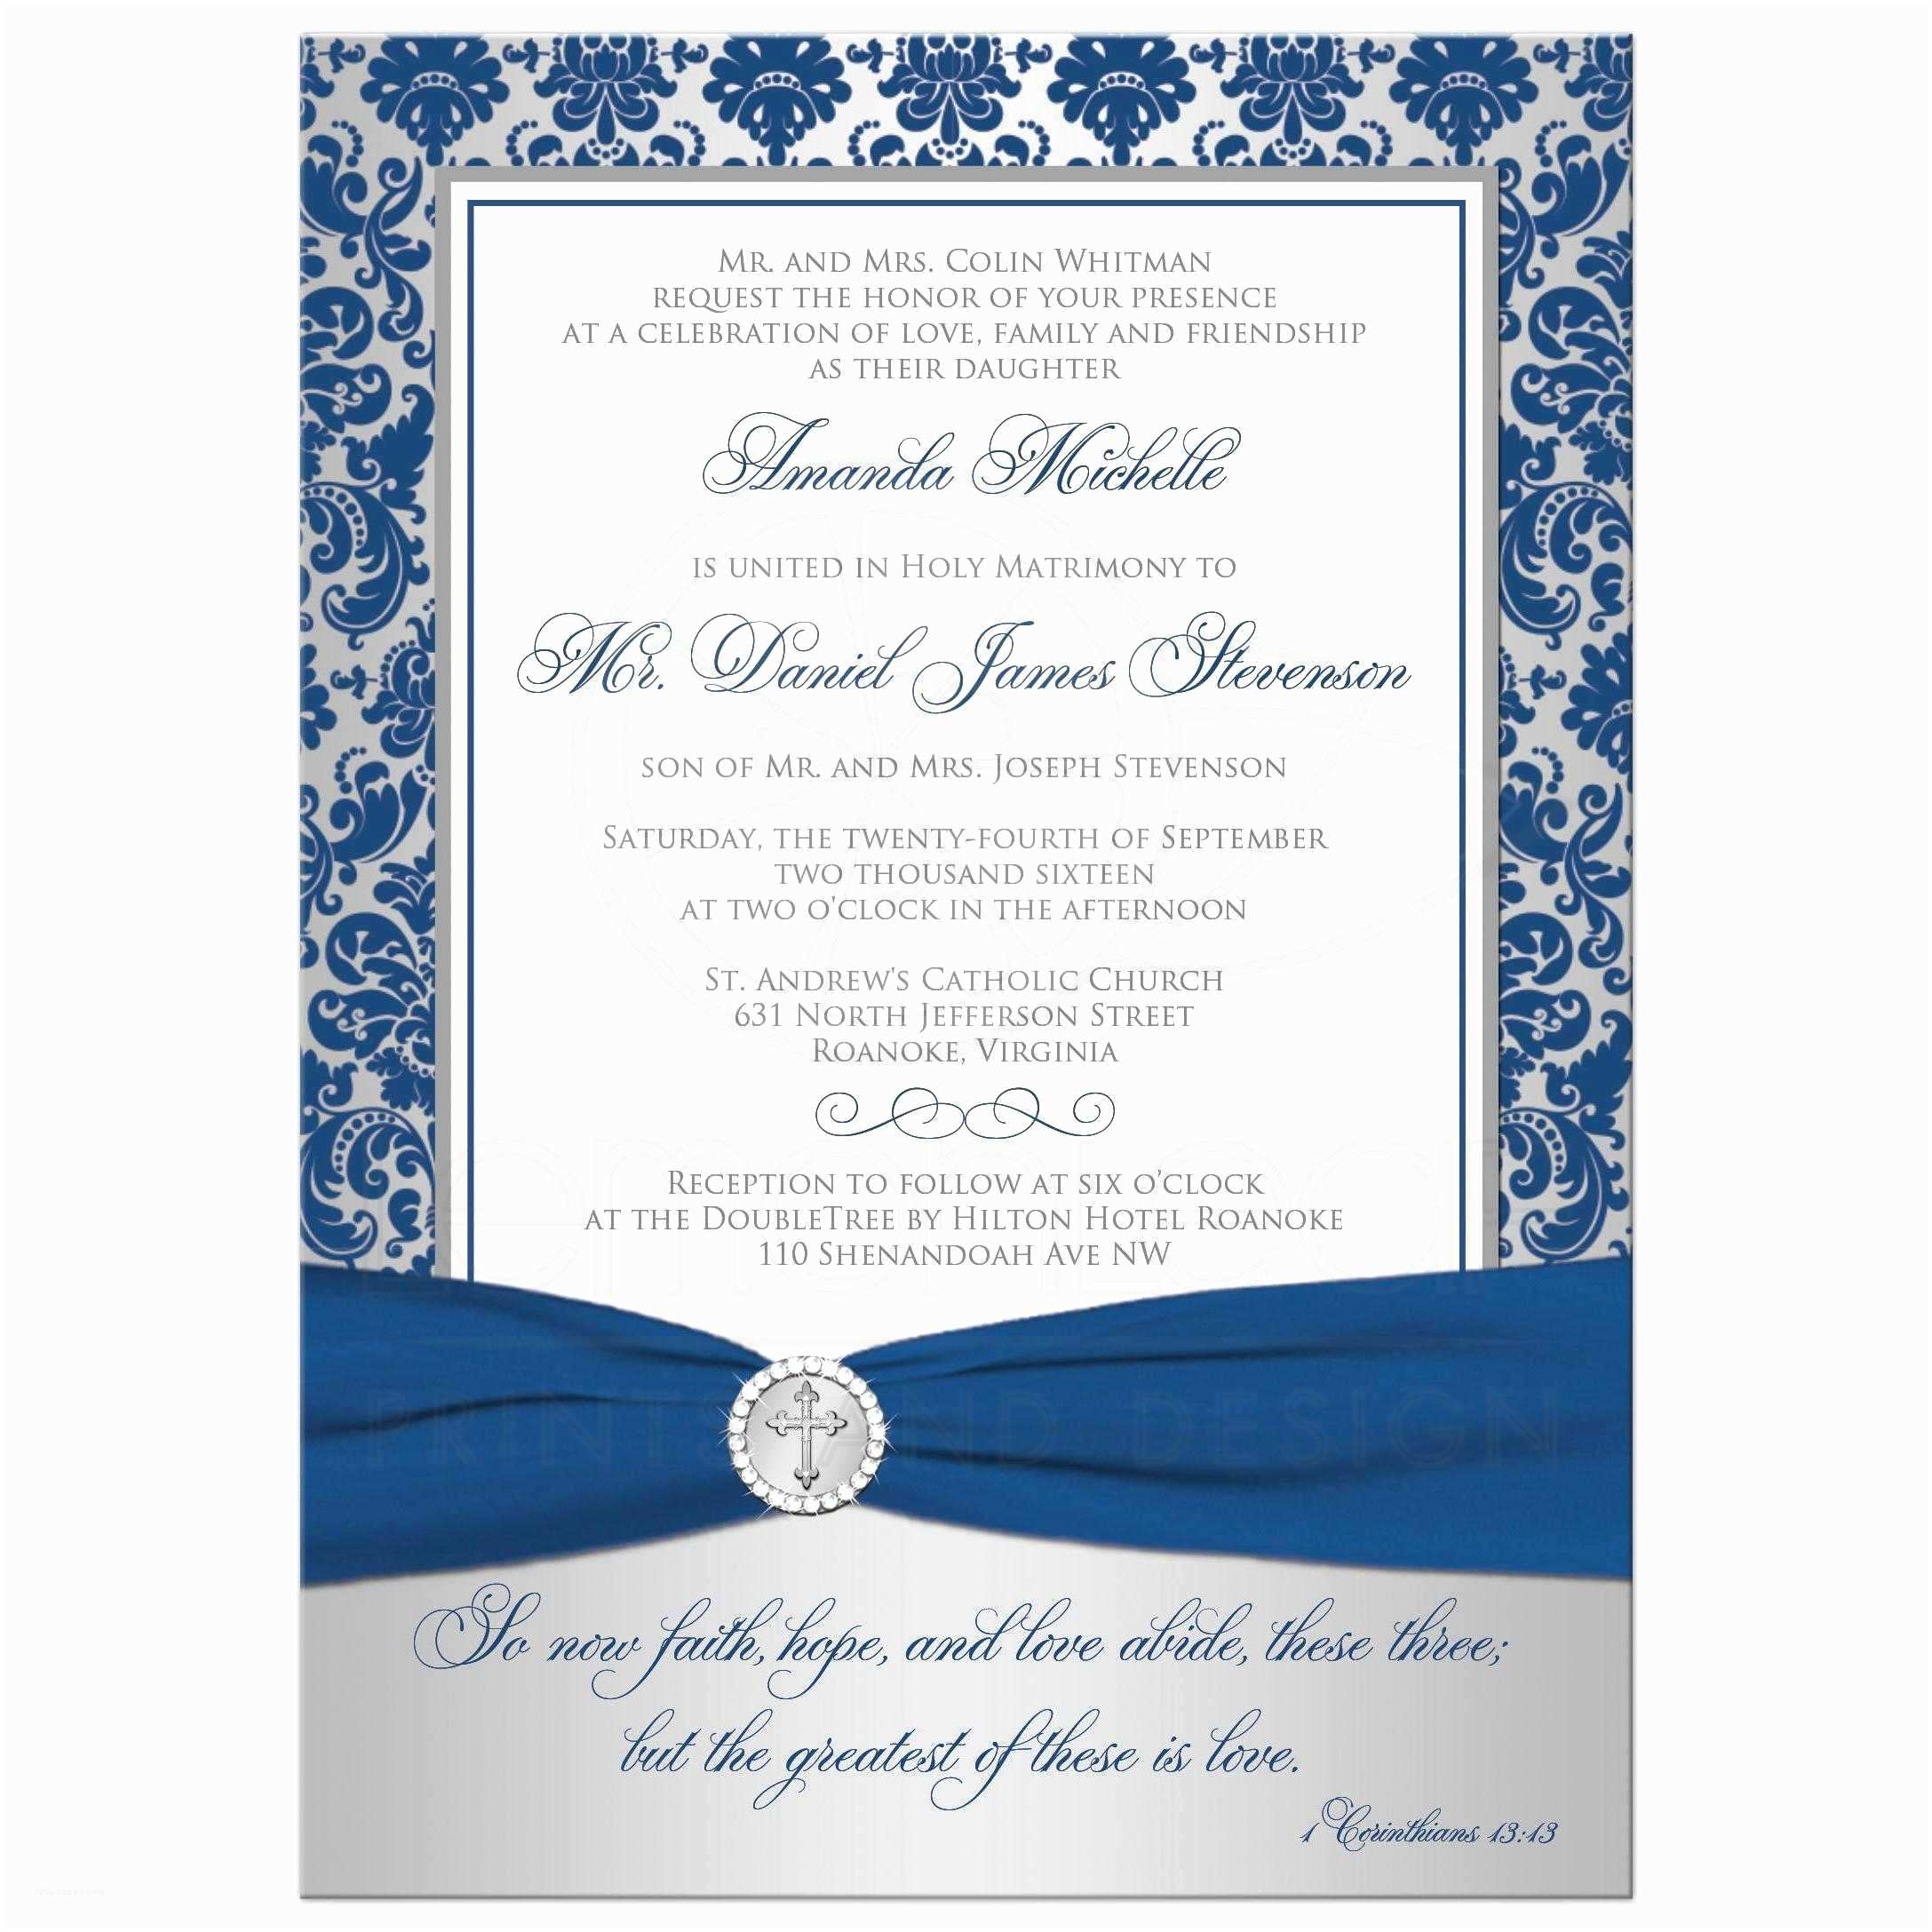 Bible Verses For Wedding Invitation Wedding Invitation Card Bible Verse Lovely